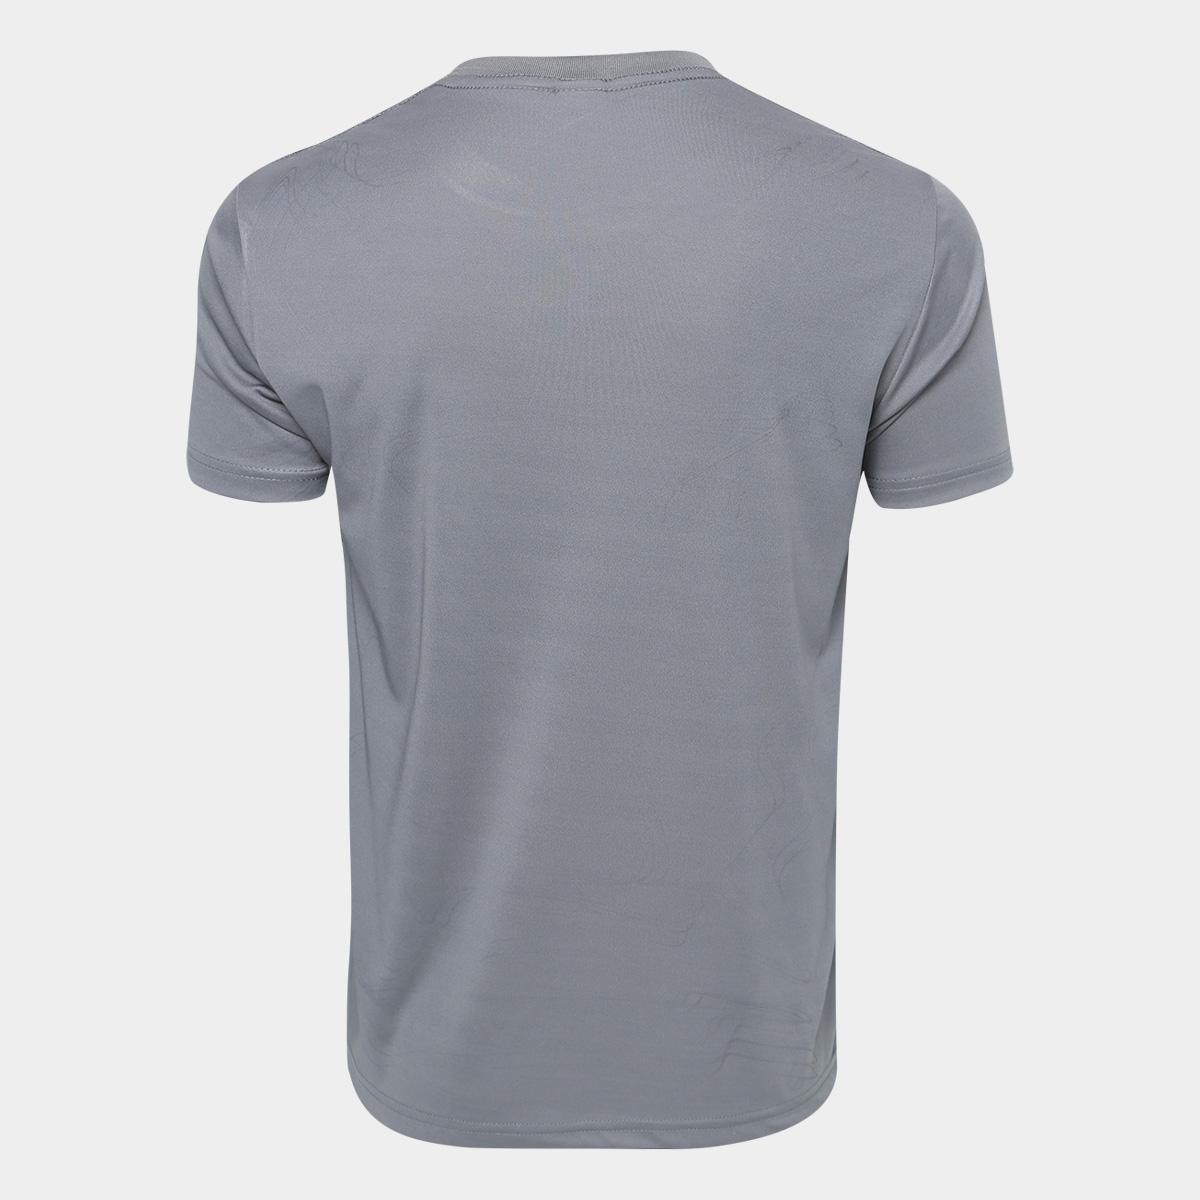 camisa kappa jenner masculina - cor chumbo. Carregando zoom. 371ddb4983d2c